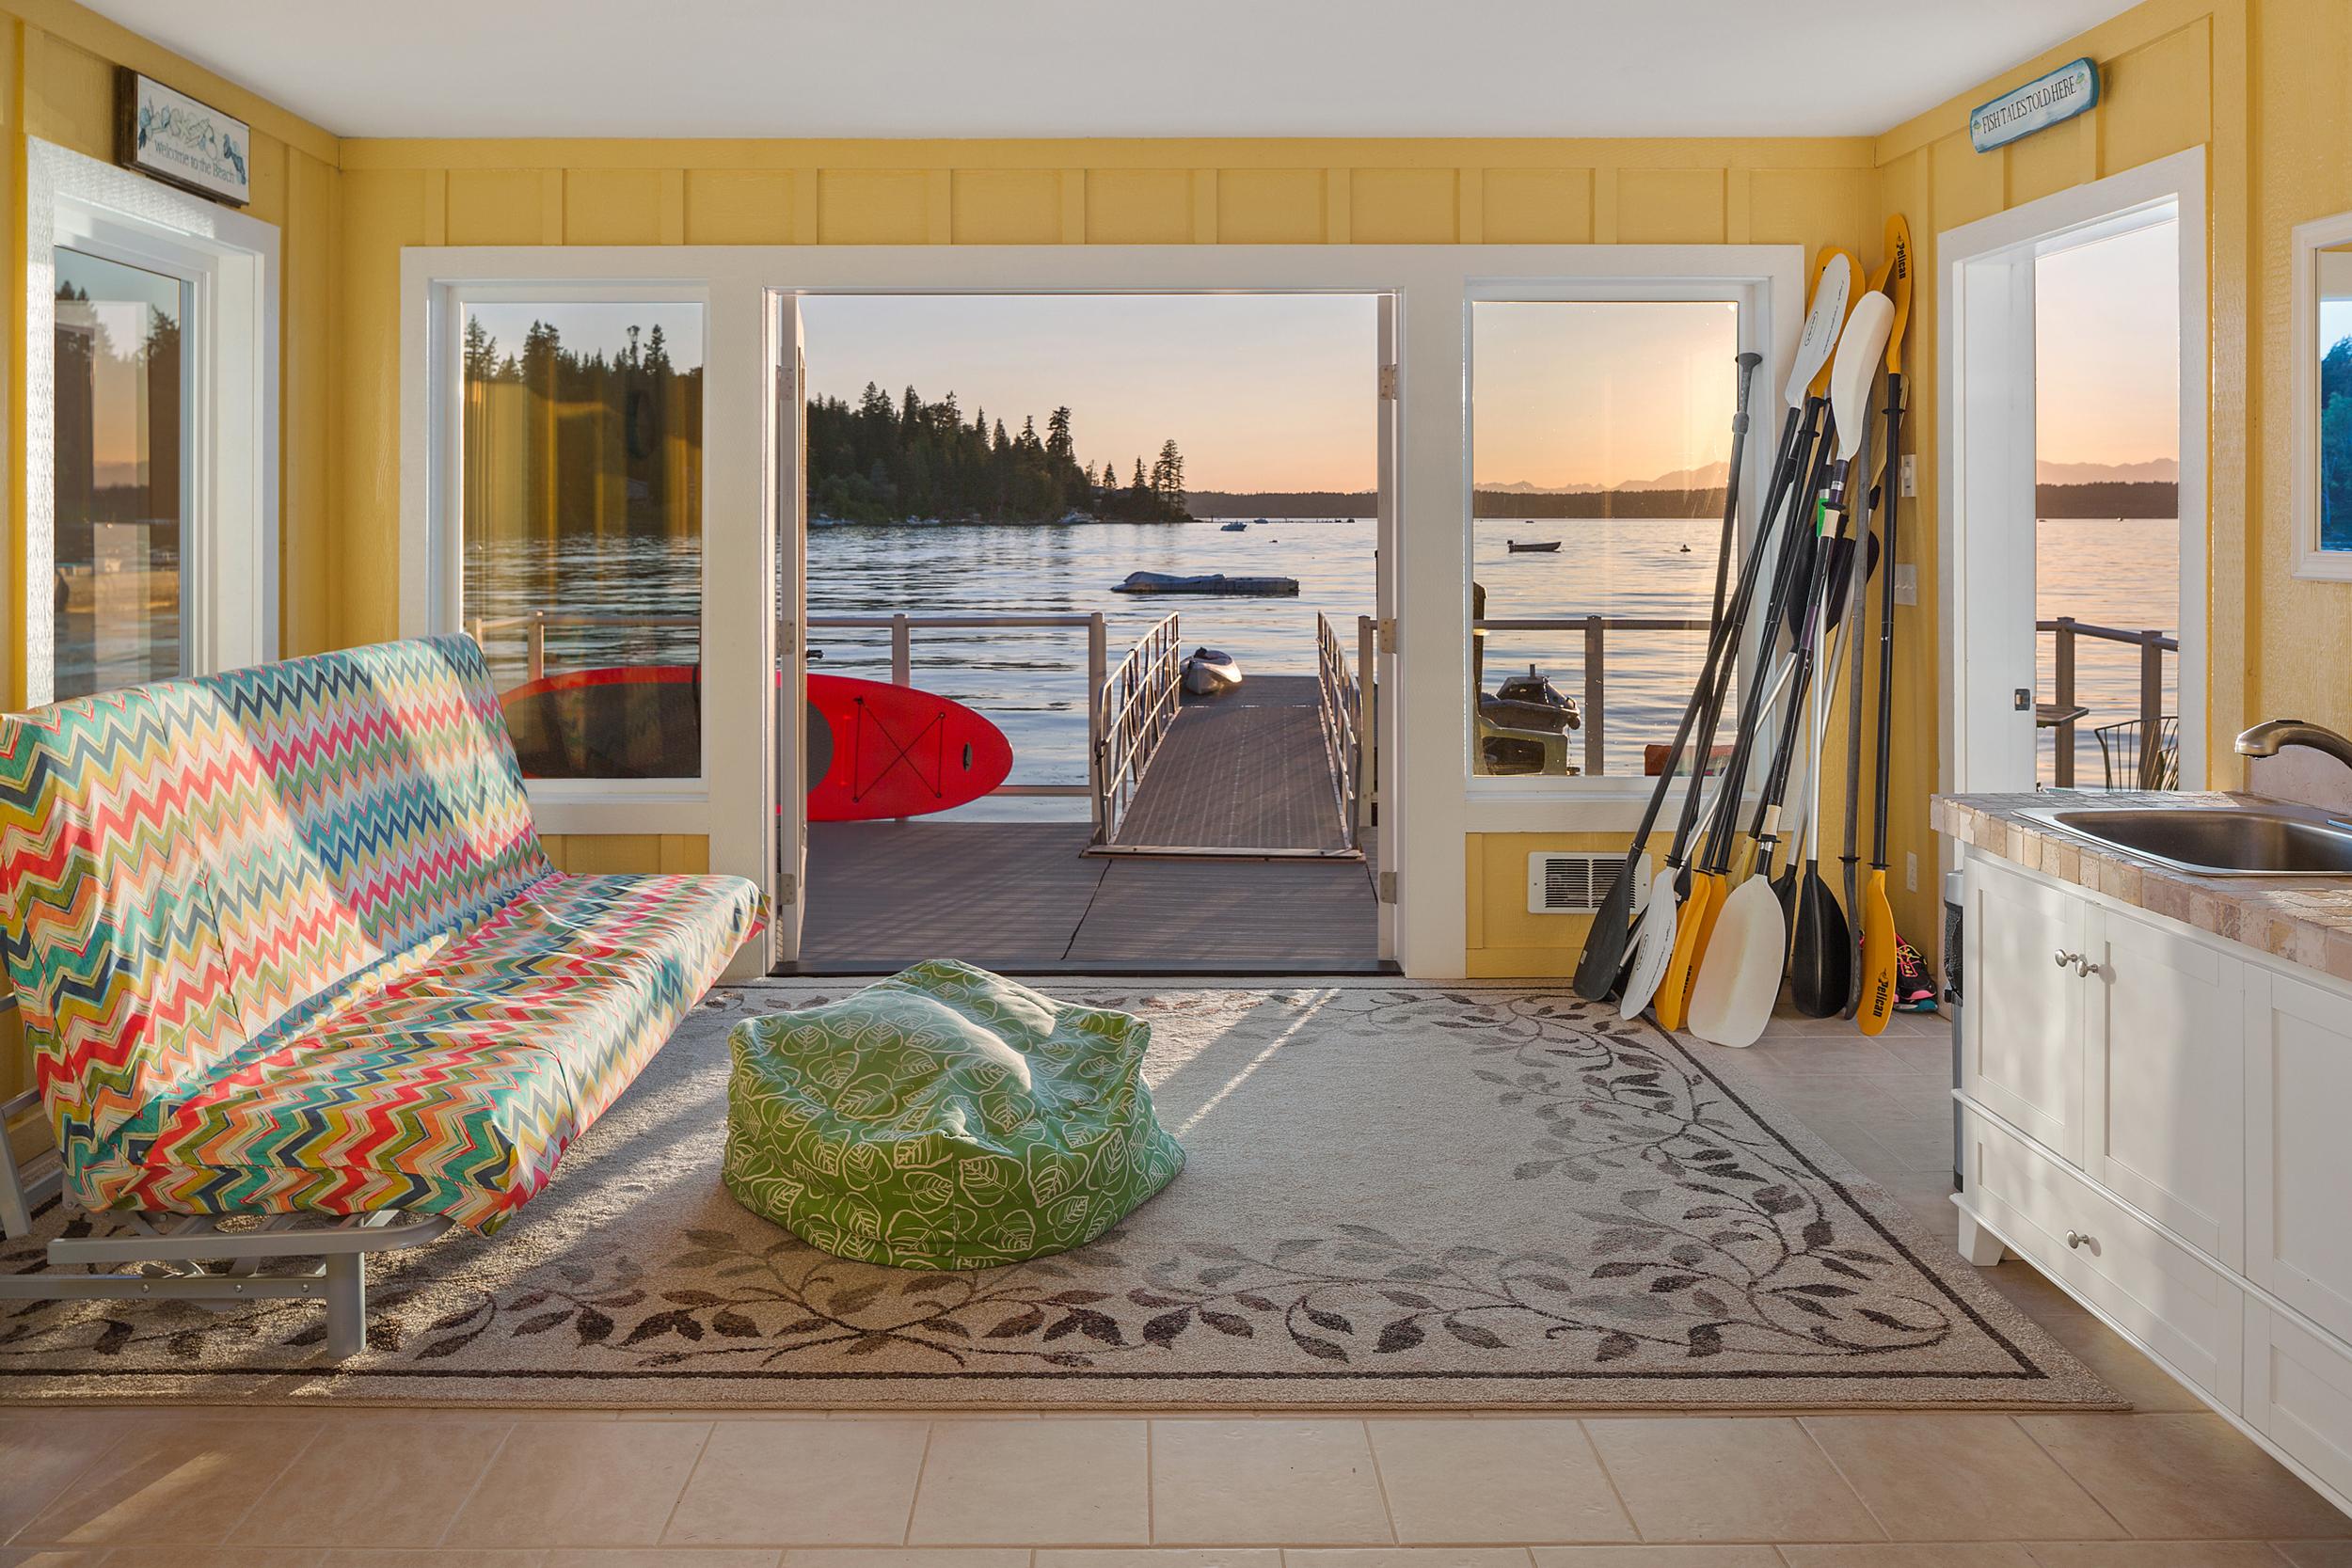 rosedale_gig_harbor_boathouse_interior.jpg